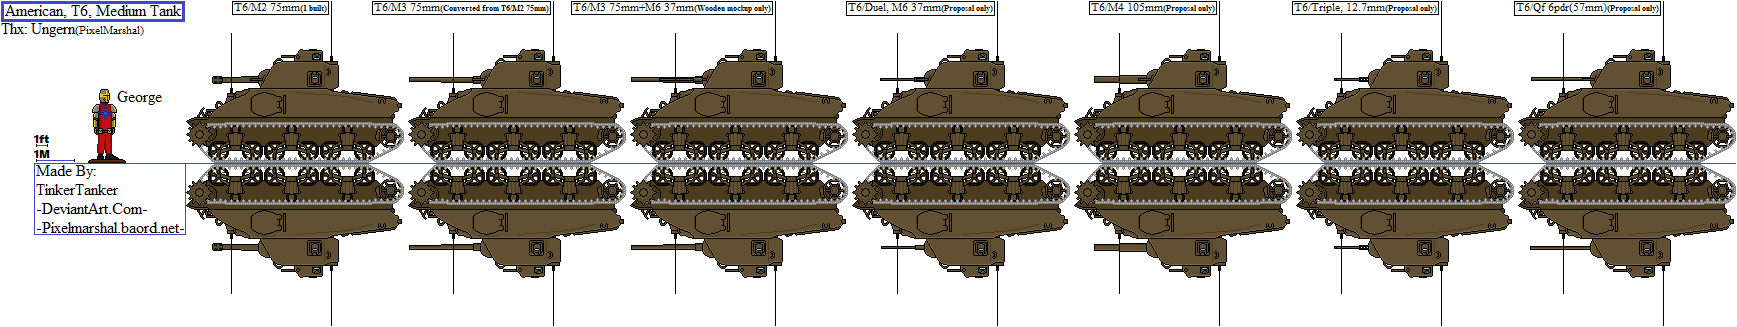 (HIST) American, T6, Medium Tank by TinkerTanker44432